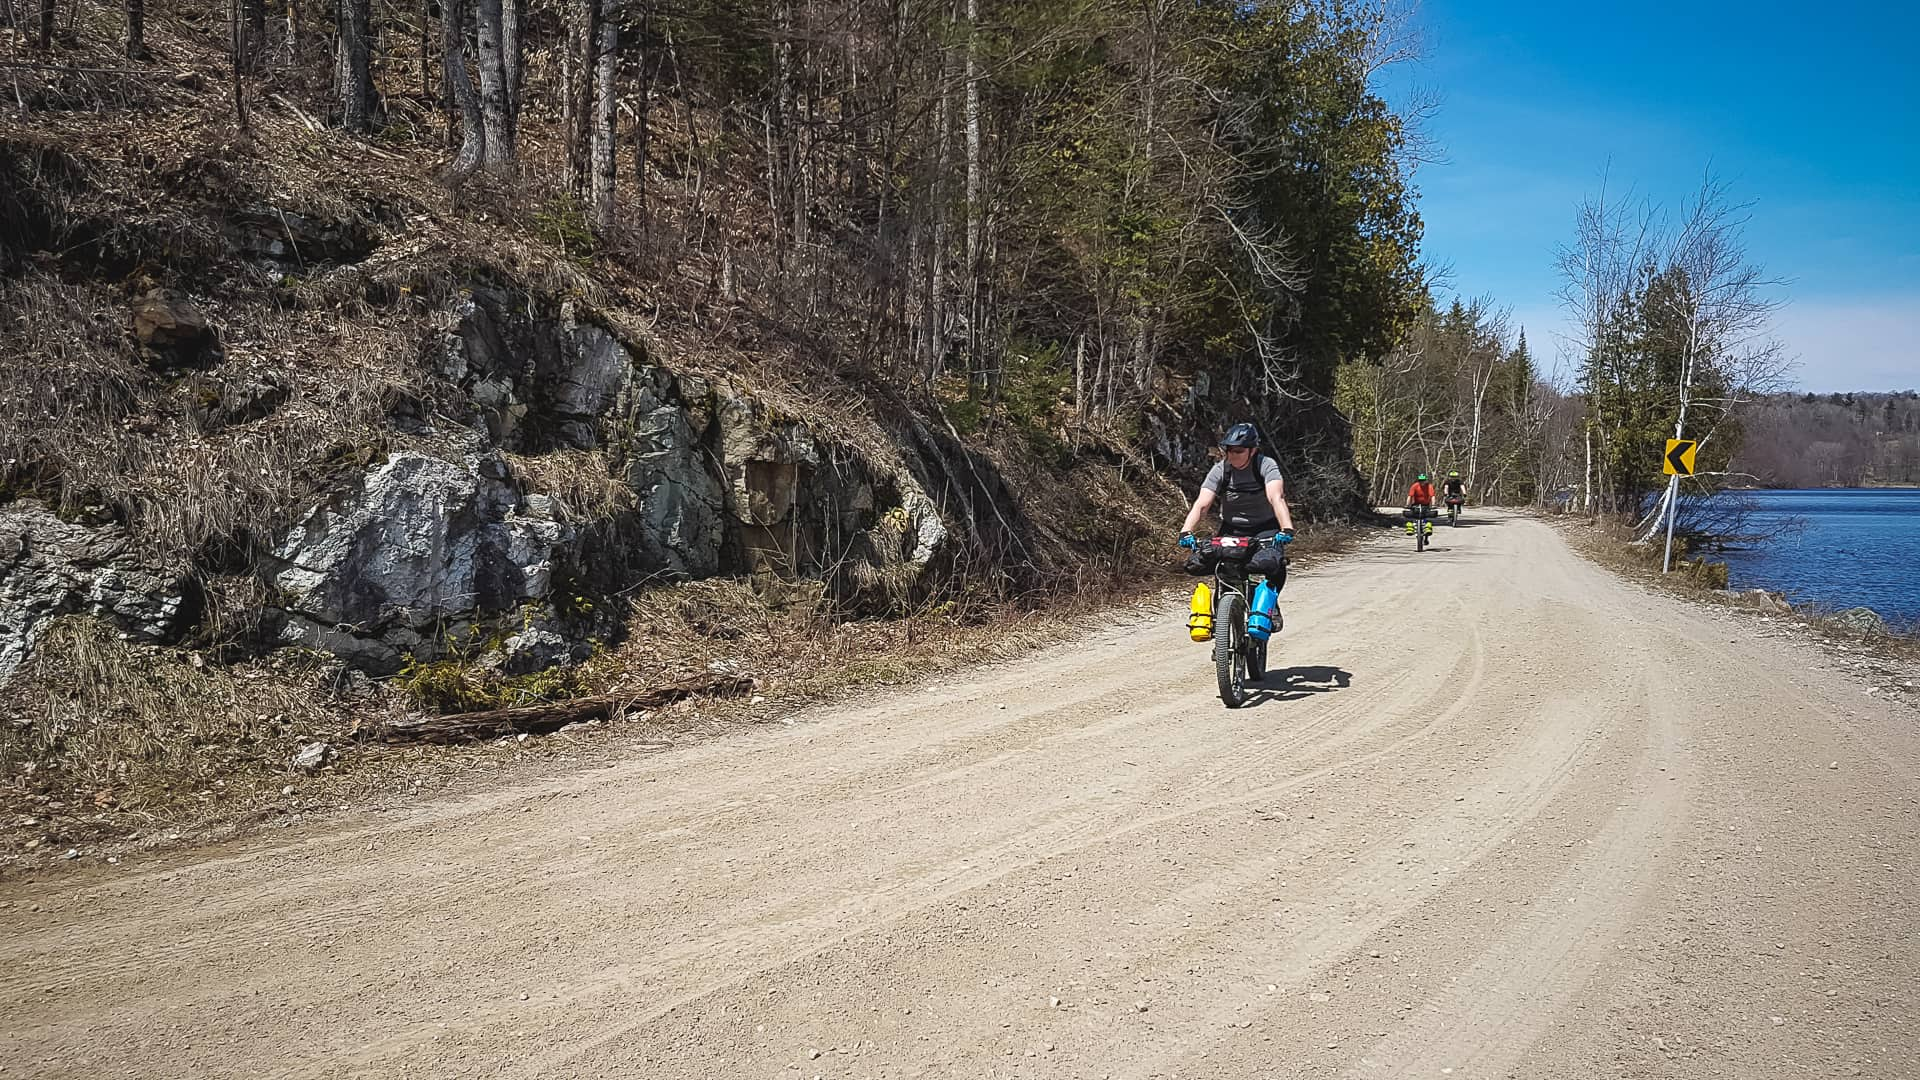 Bikepacking Calabogie area Ontario with Panorama cycles